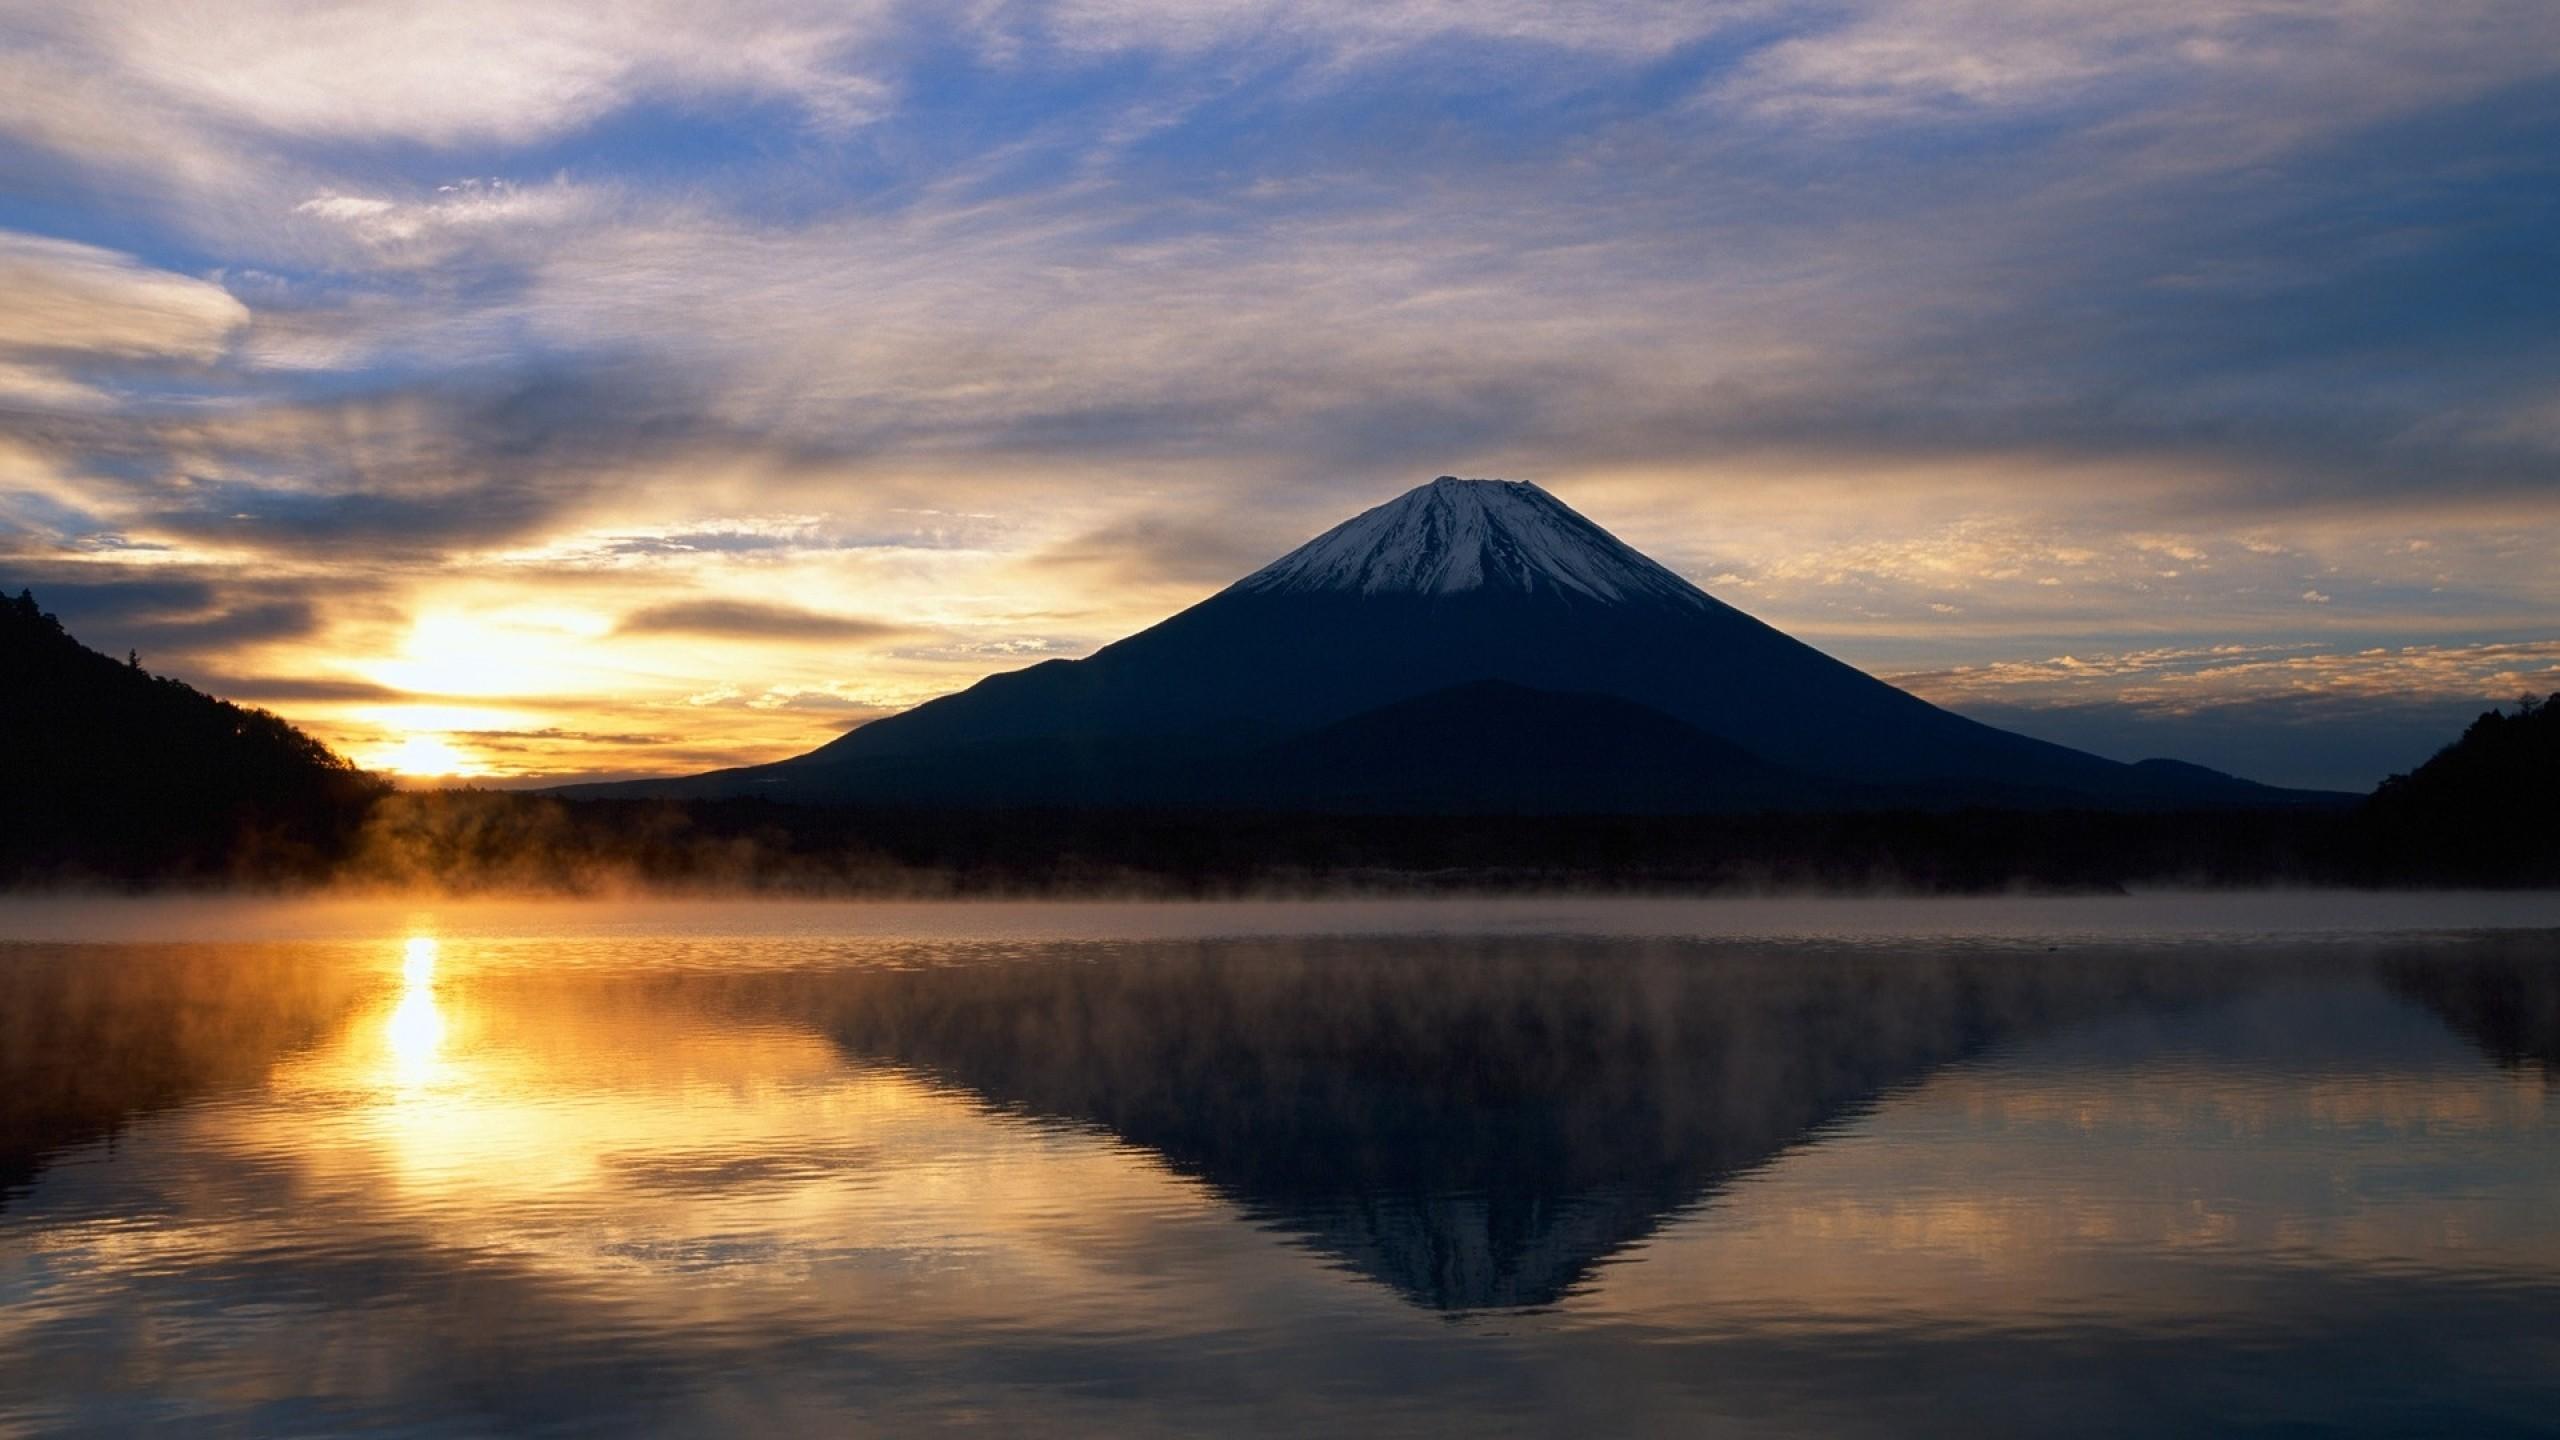 General 2560x1440 landscape nature sunlight water reflection sky lake Mount Fuji Japan